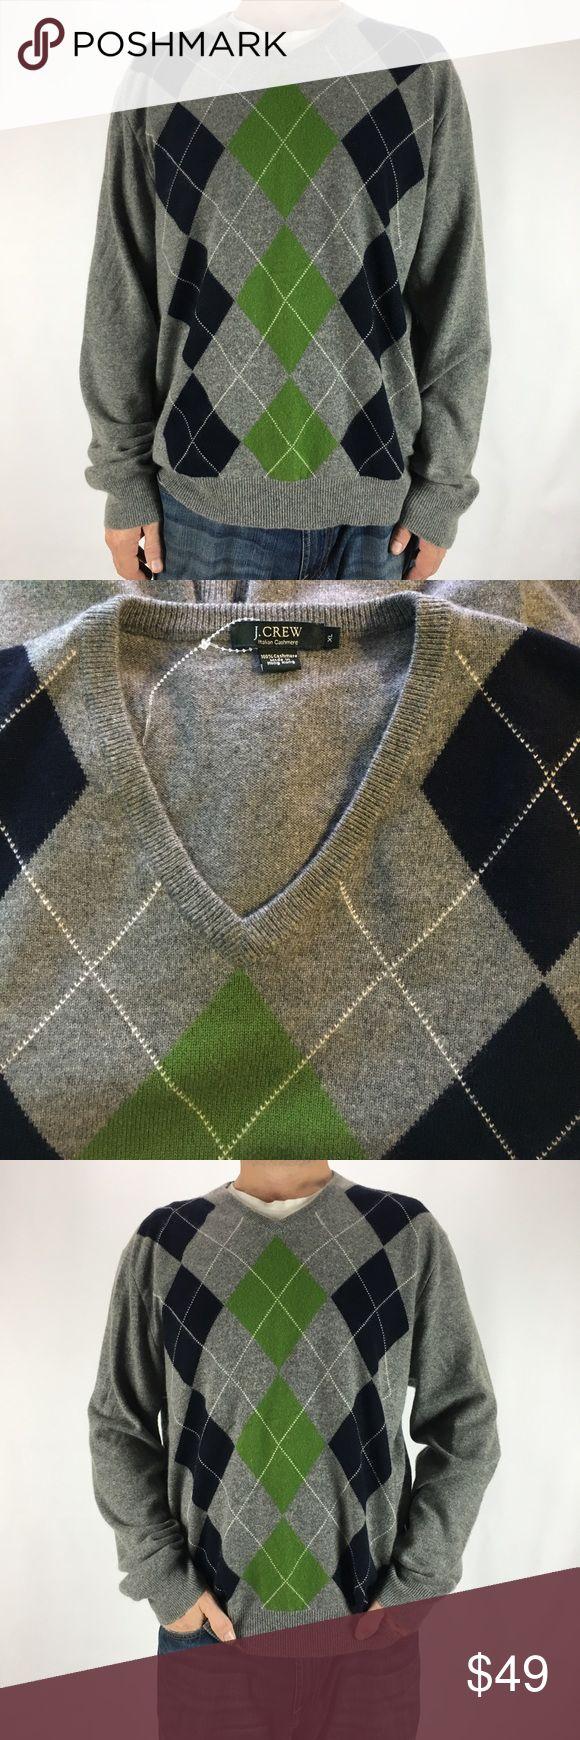 "Men's J.CREW Italian Cashmere Argyle Sweater XL Men's J.CREW 100% Italian Cashmere Argyle Sweater - V-neck, Gray/Navy/Green  Excellent condition  Armpit to armpit 25"" Sleeves 26"" Length 27"" J. Crew Sweaters V-Neck"